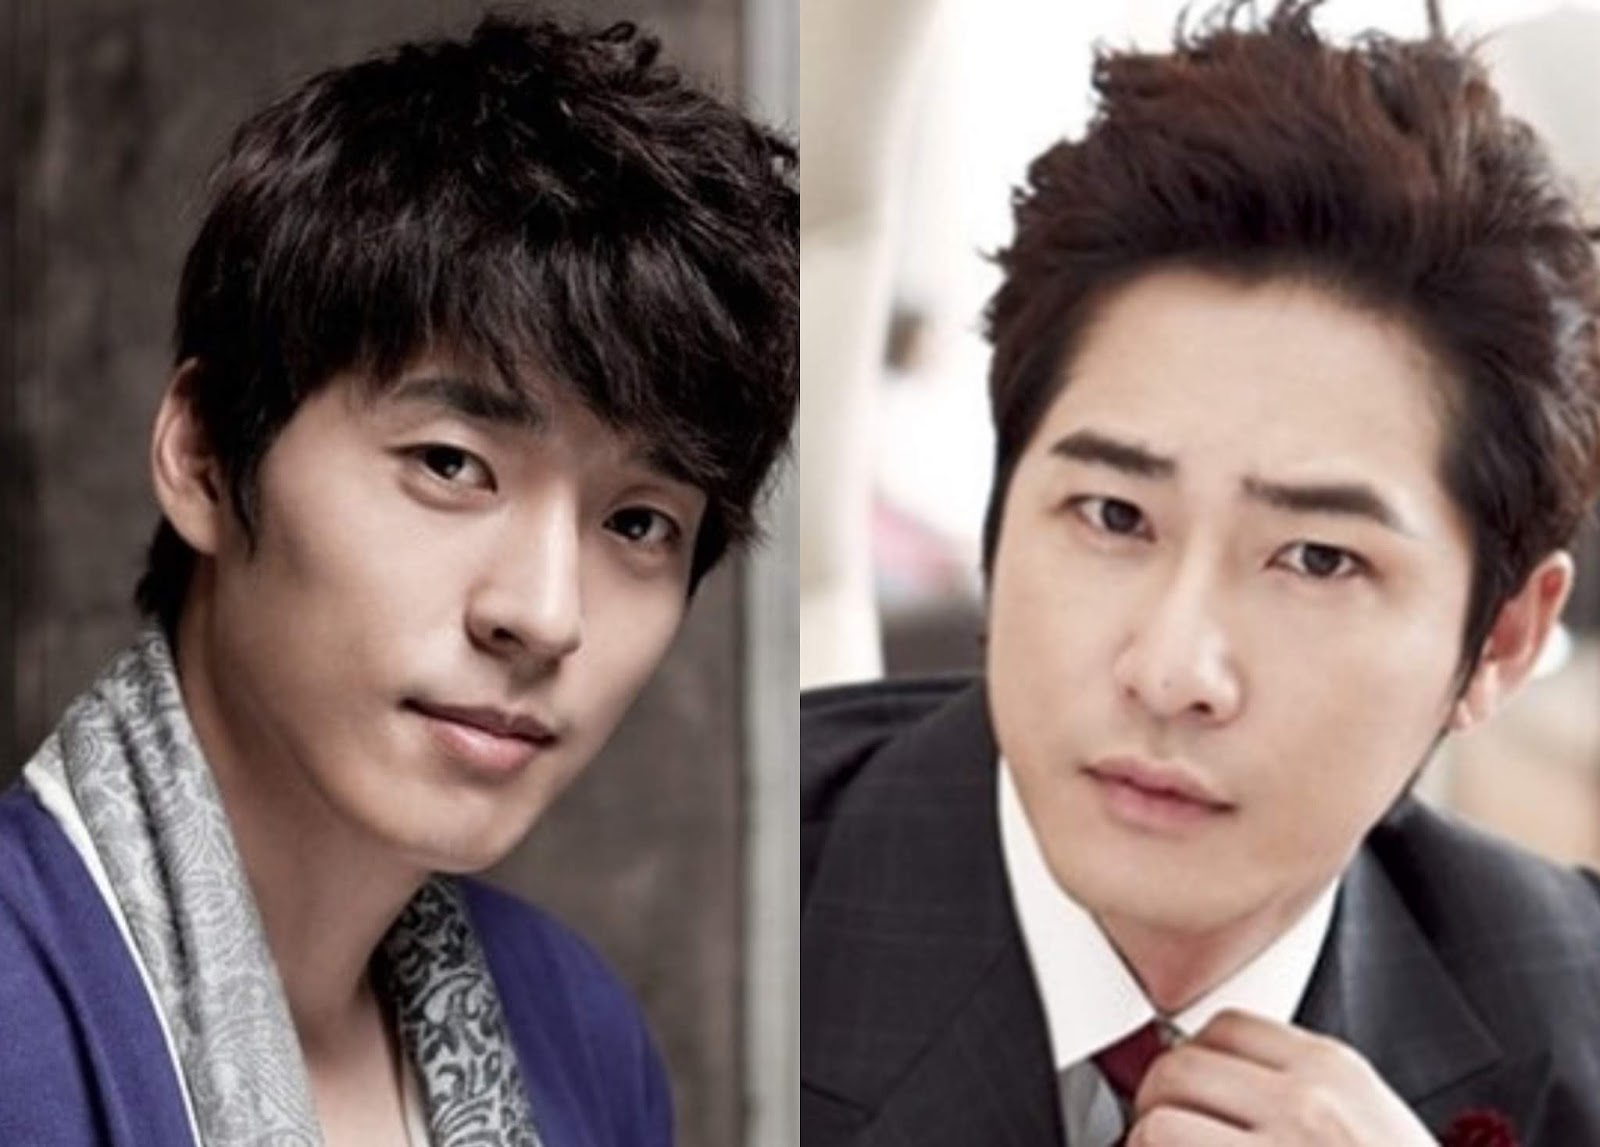 Seo Ji Suk may take up Kang Ji Hwan's role in Joseon